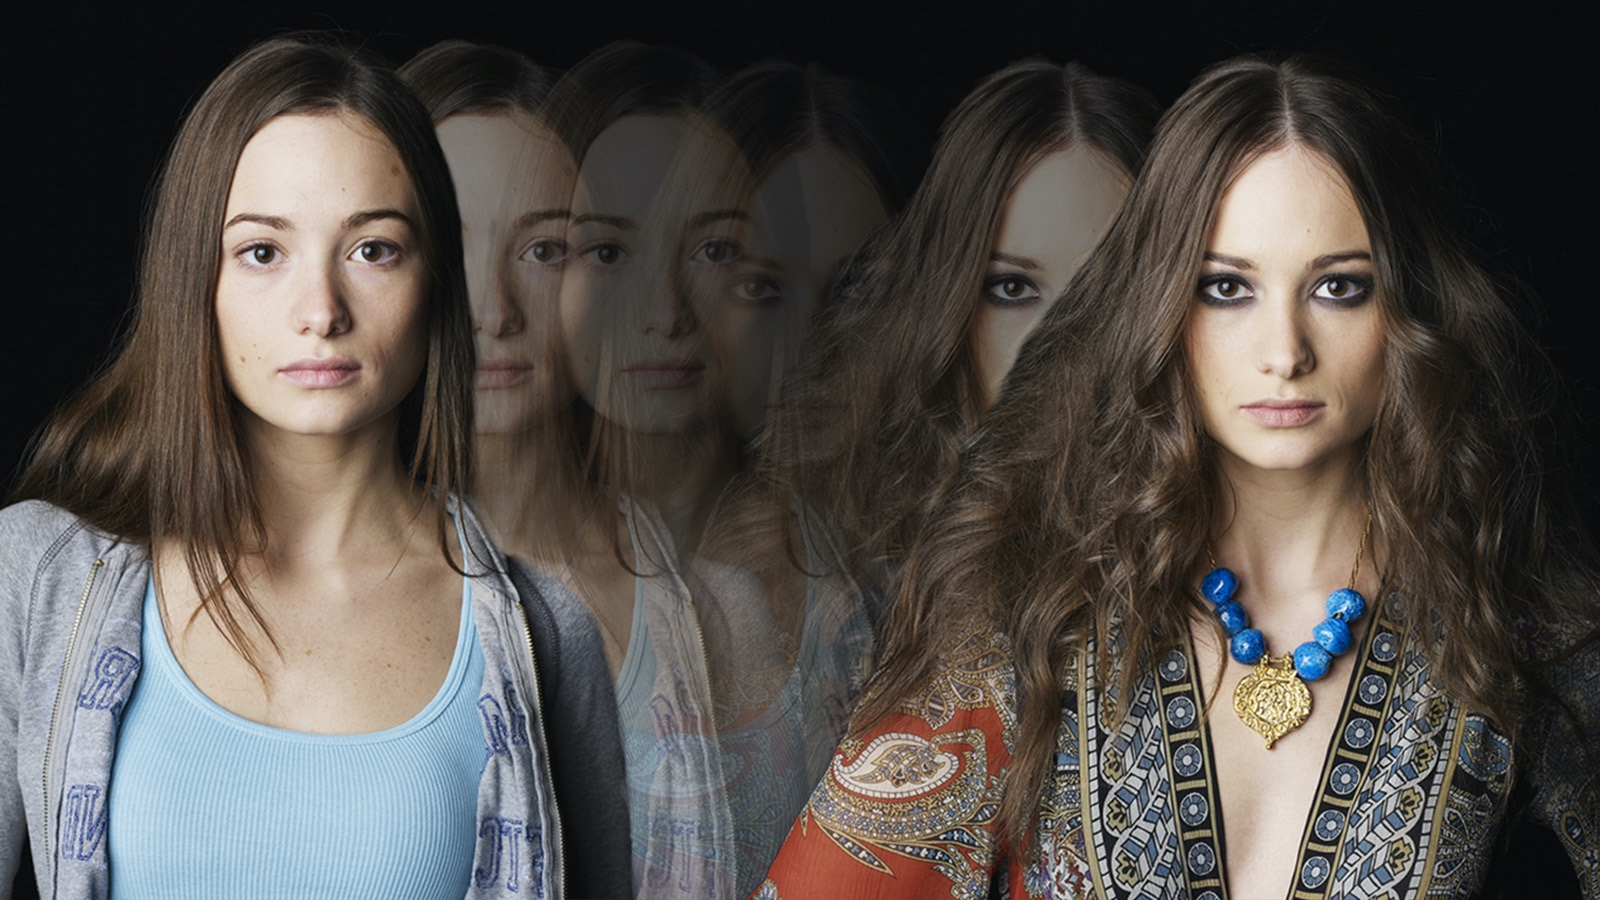 woman dynamic character transforming